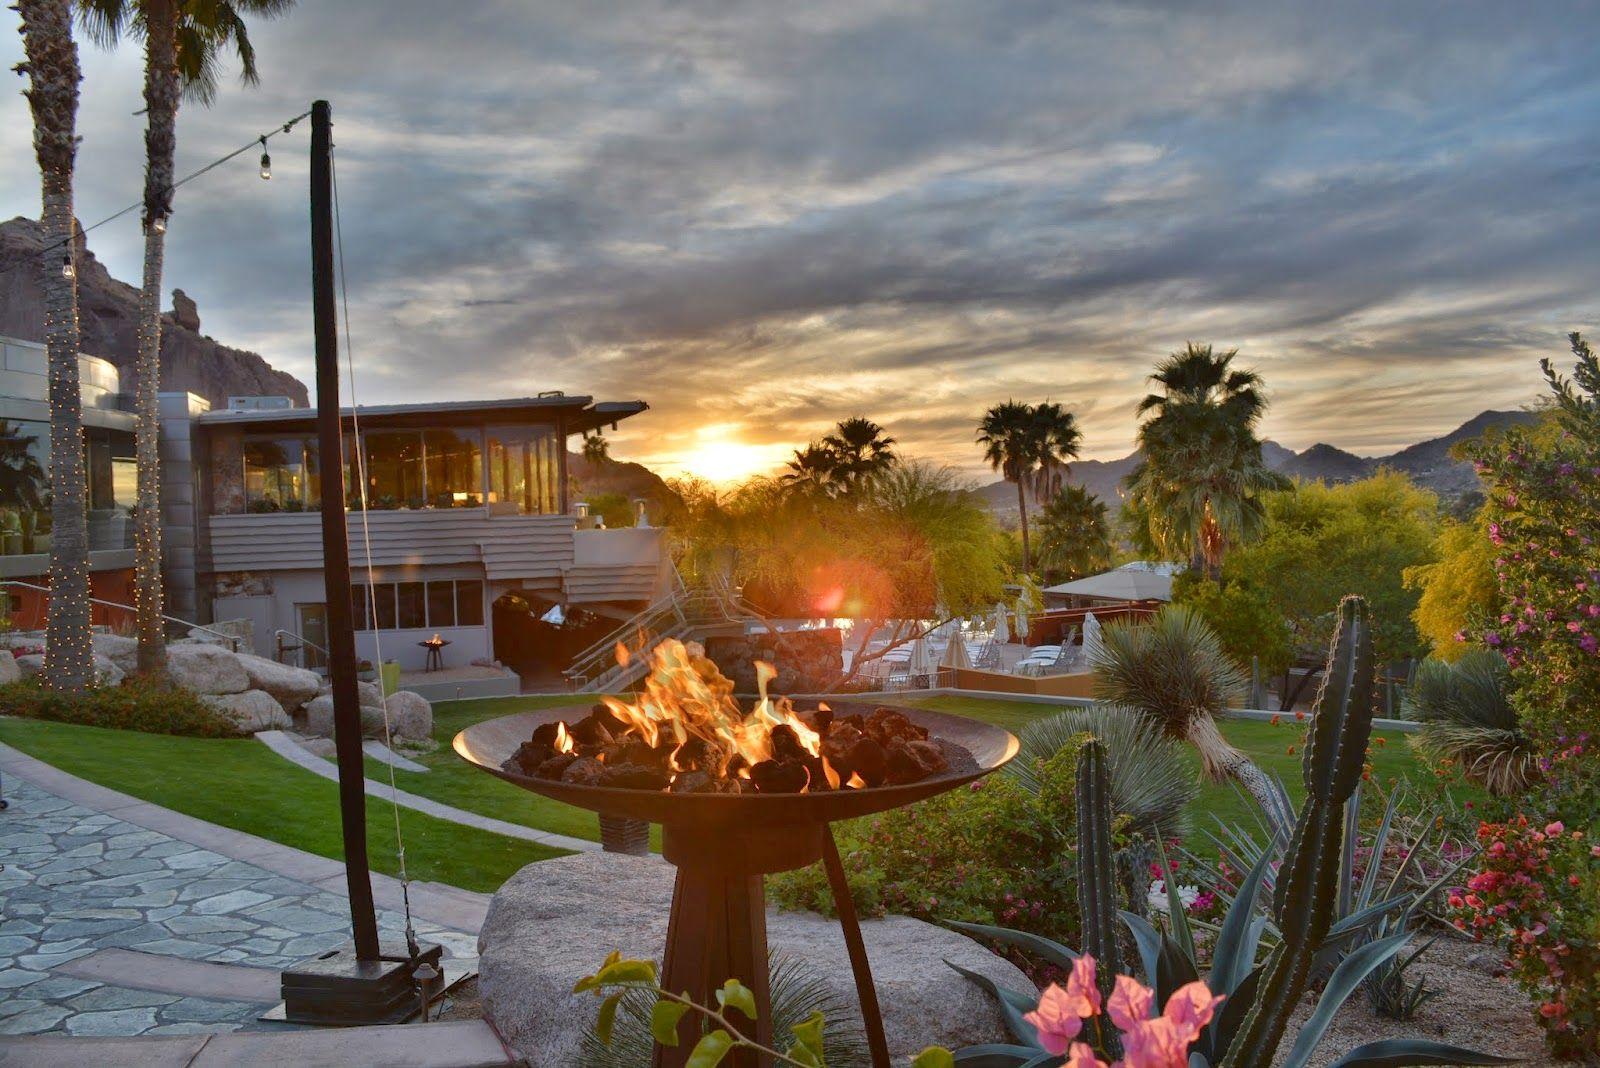 df7e1fbed5 Hotel Review: Sanctuary on Camelback Mountain Resort & Spa  (Scottsdale,Arizona)